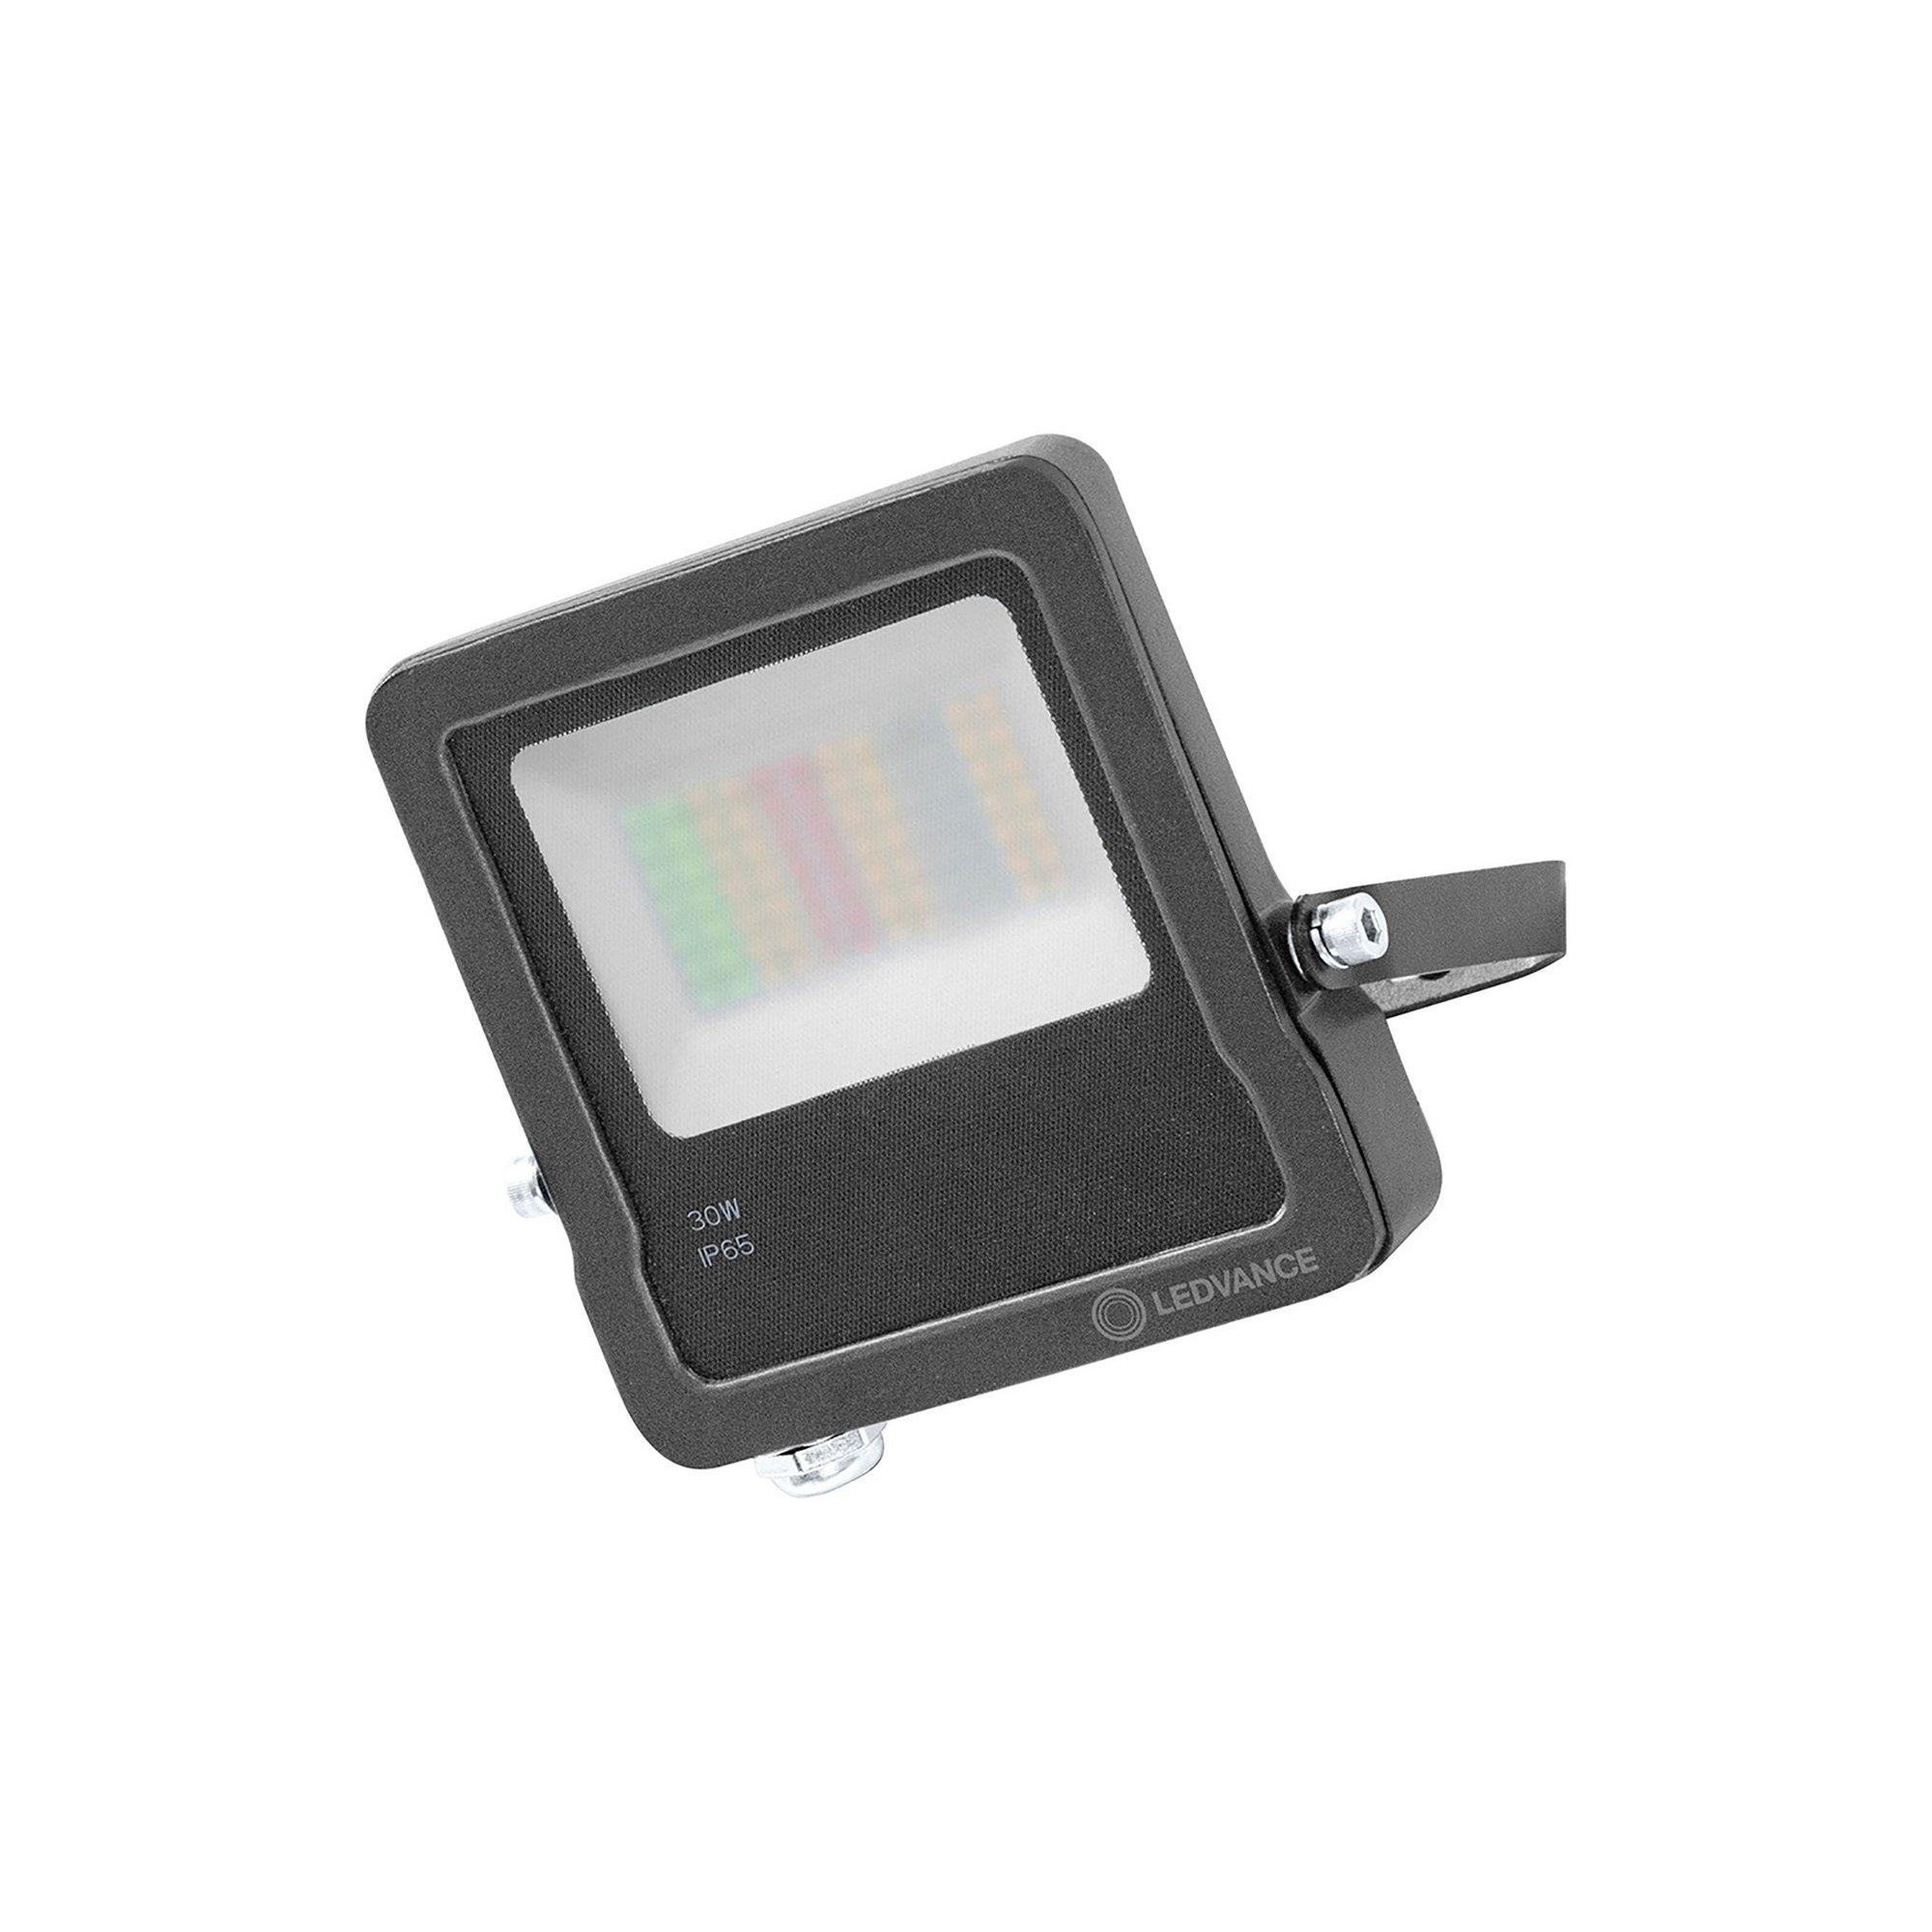 Image of Ledvance Smart+ Wi-Fi 30w Floodlight